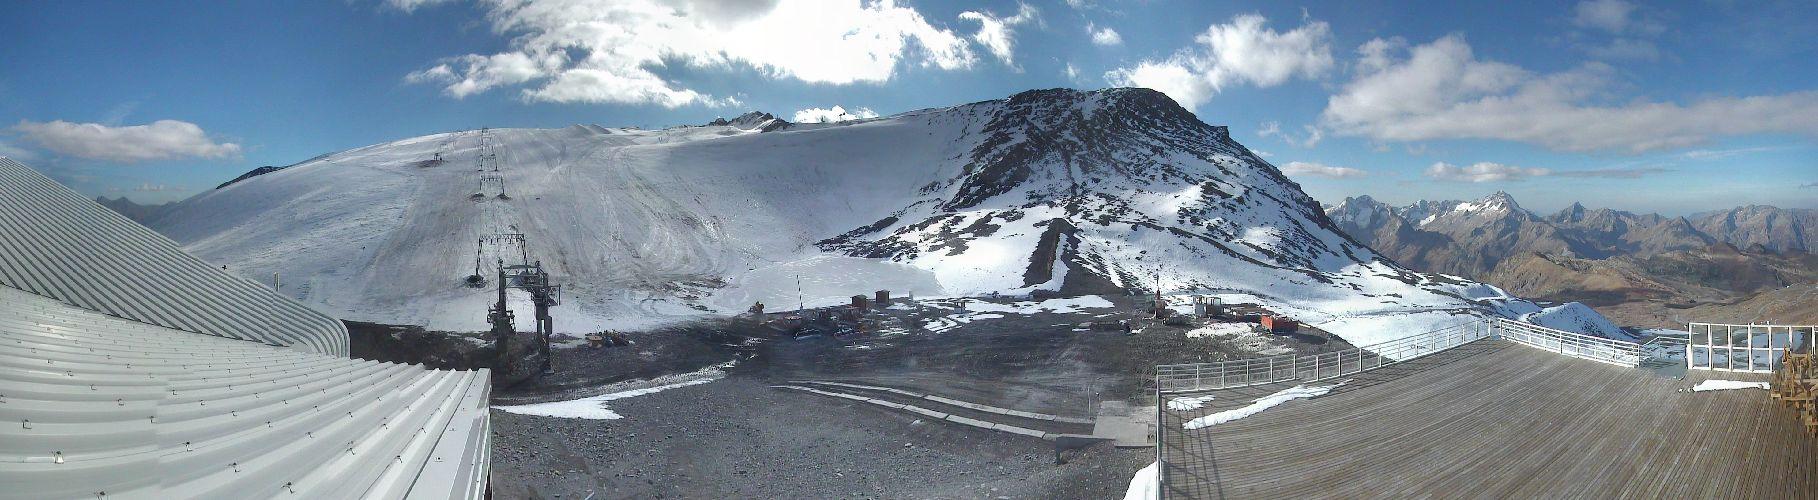 Deux Alpes front du glacier octobre 2012